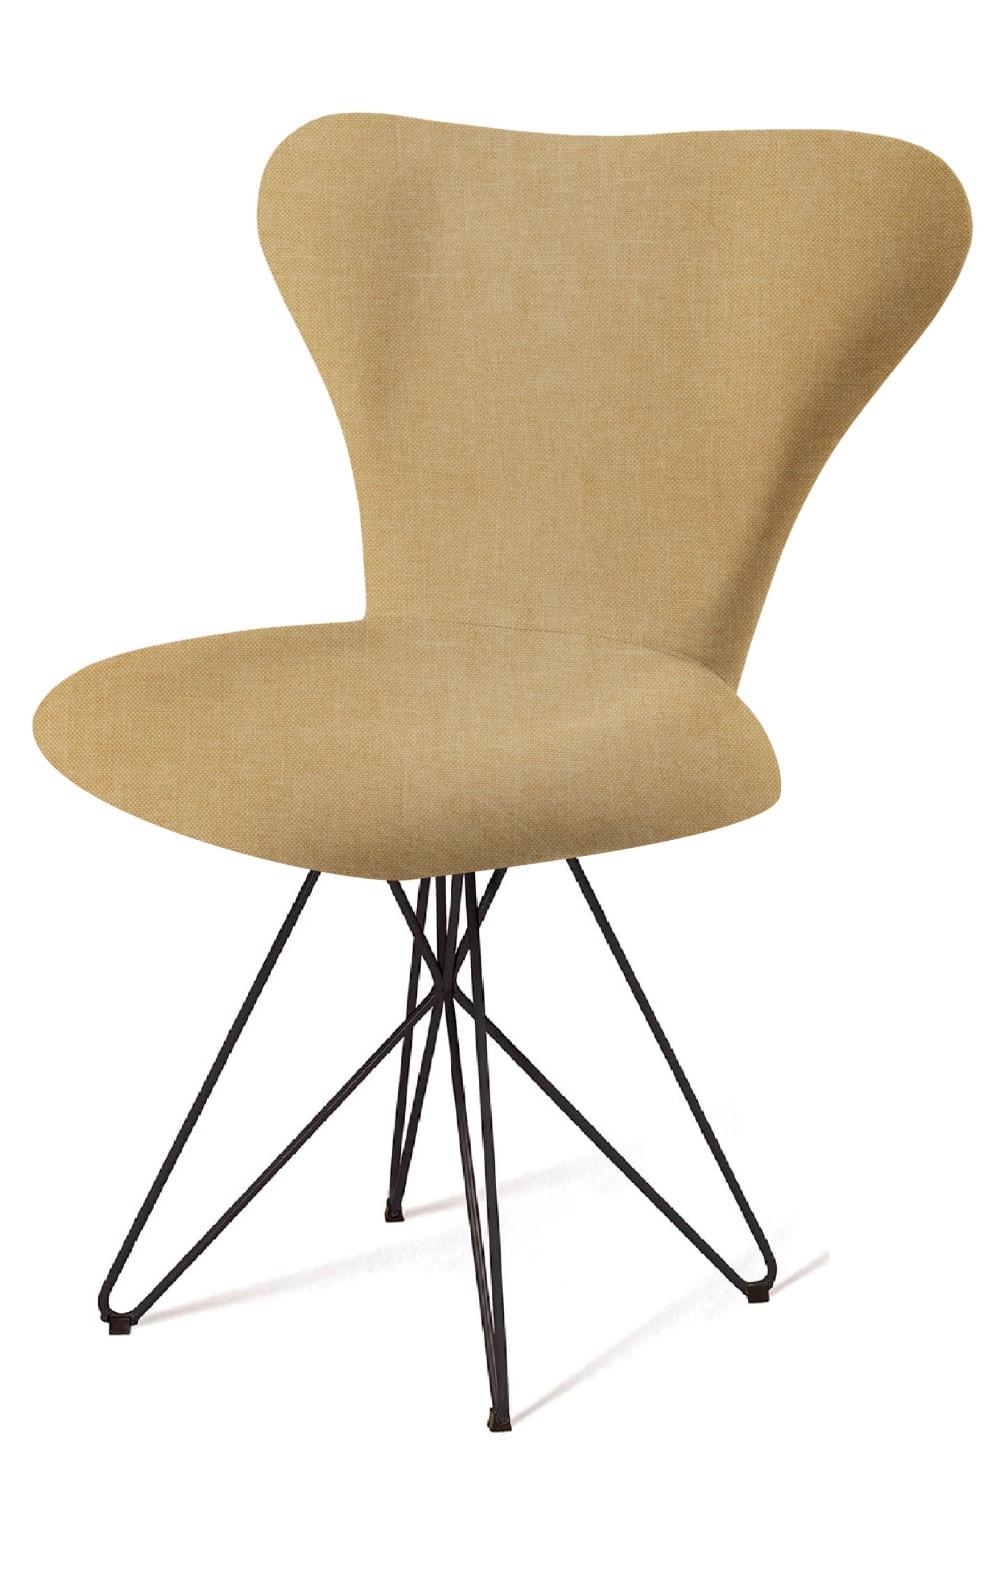 Cadeira Jacobsen Series 7 Bege com Base Estrela Preta - 55924